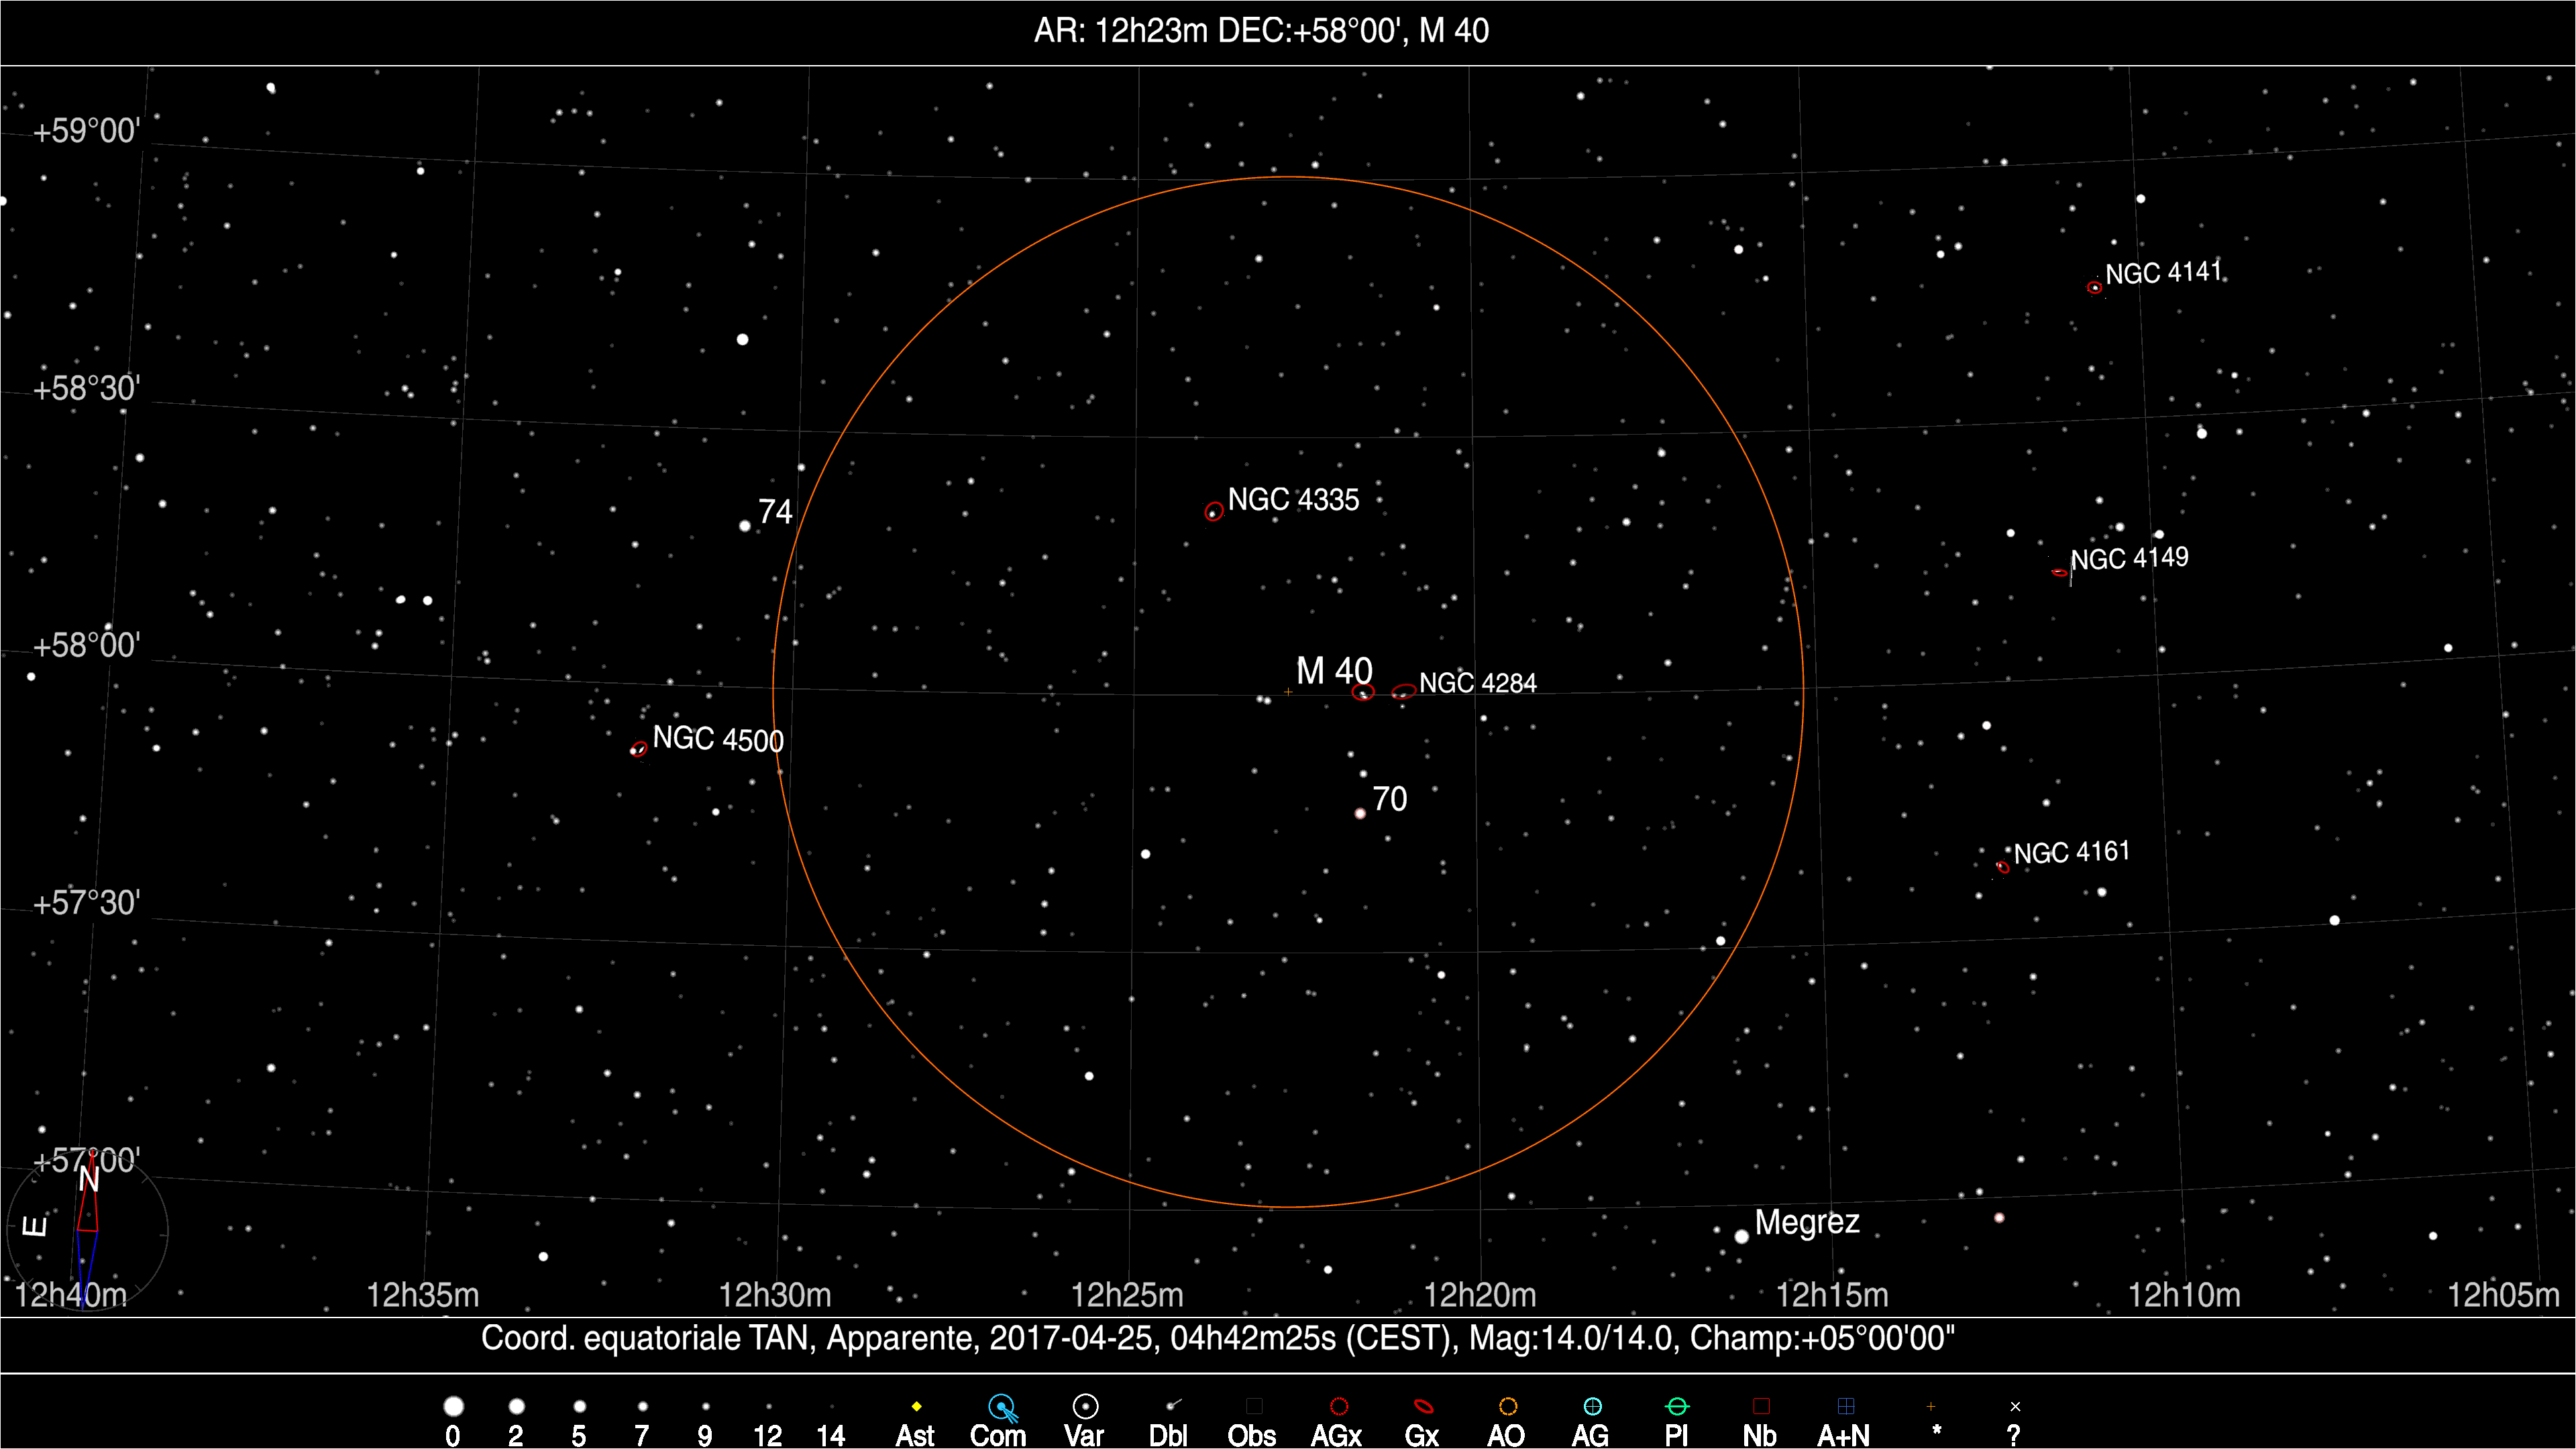 M40_5